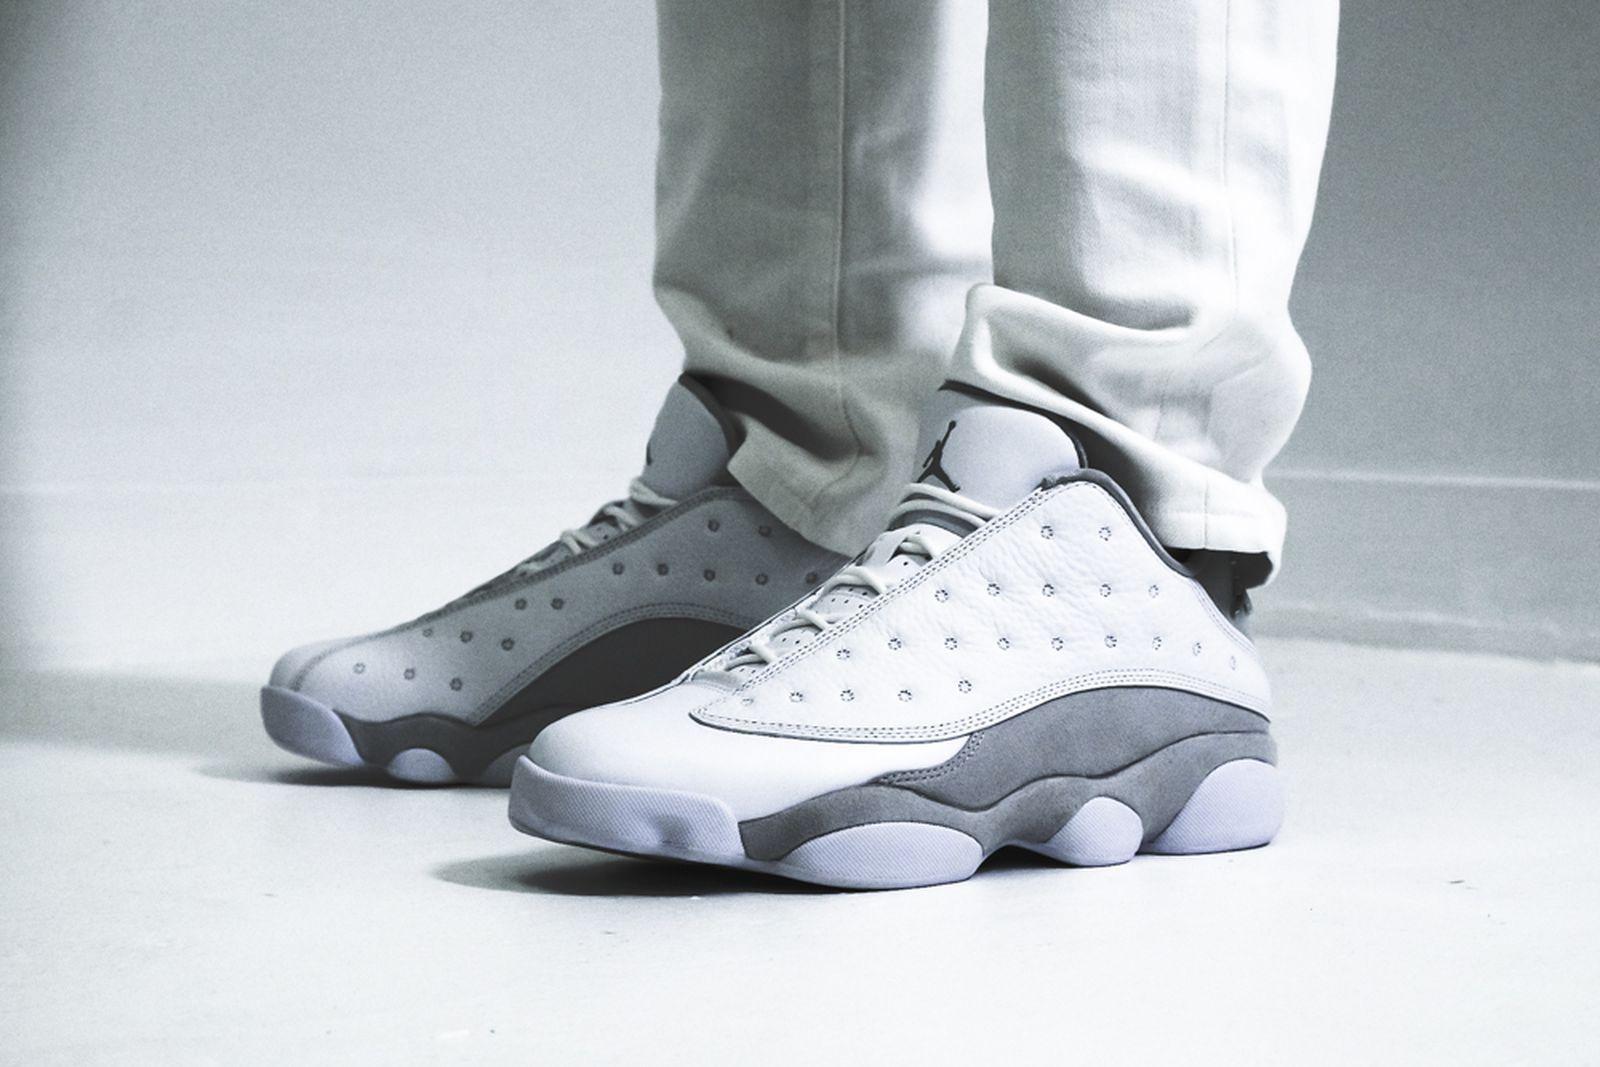 Jordan_Pure_Money_Collection__7